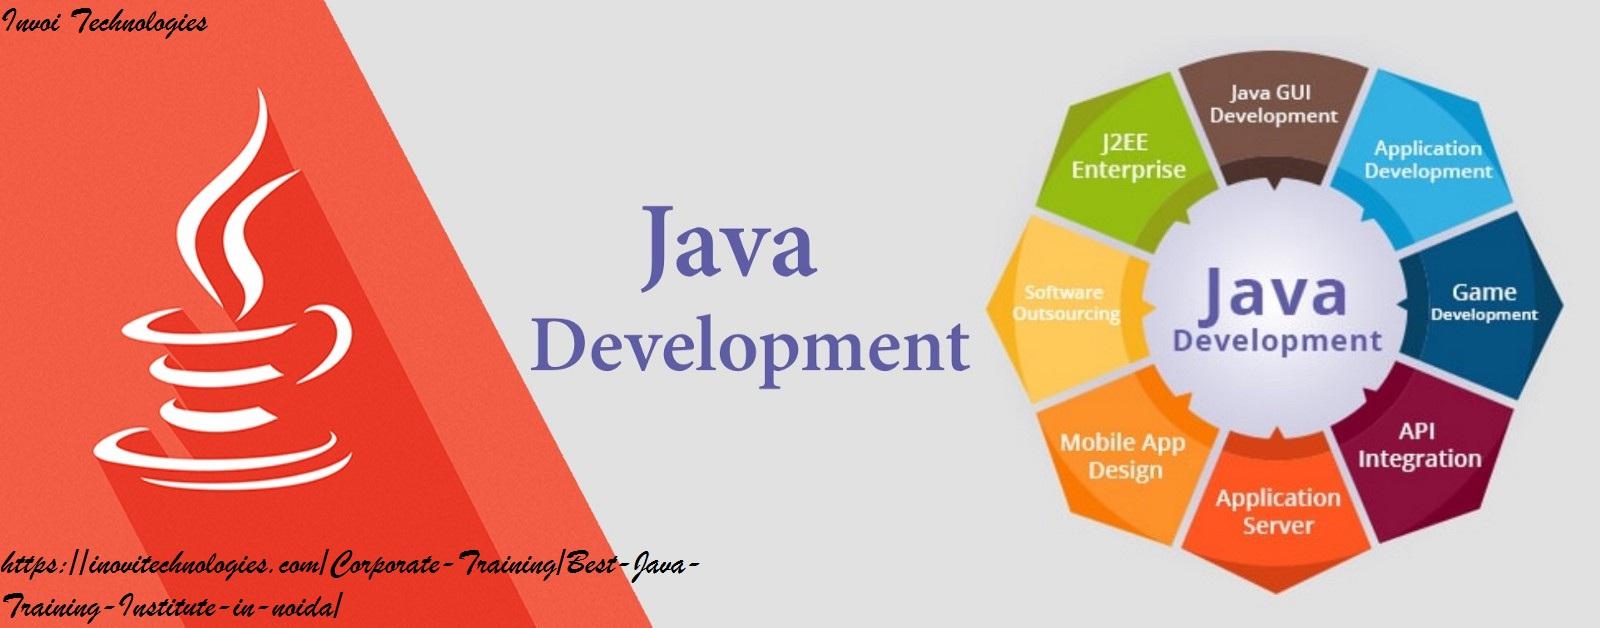 Best java training institute in noida, Gautam Buddh Nagar, Uttar Pradesh, India